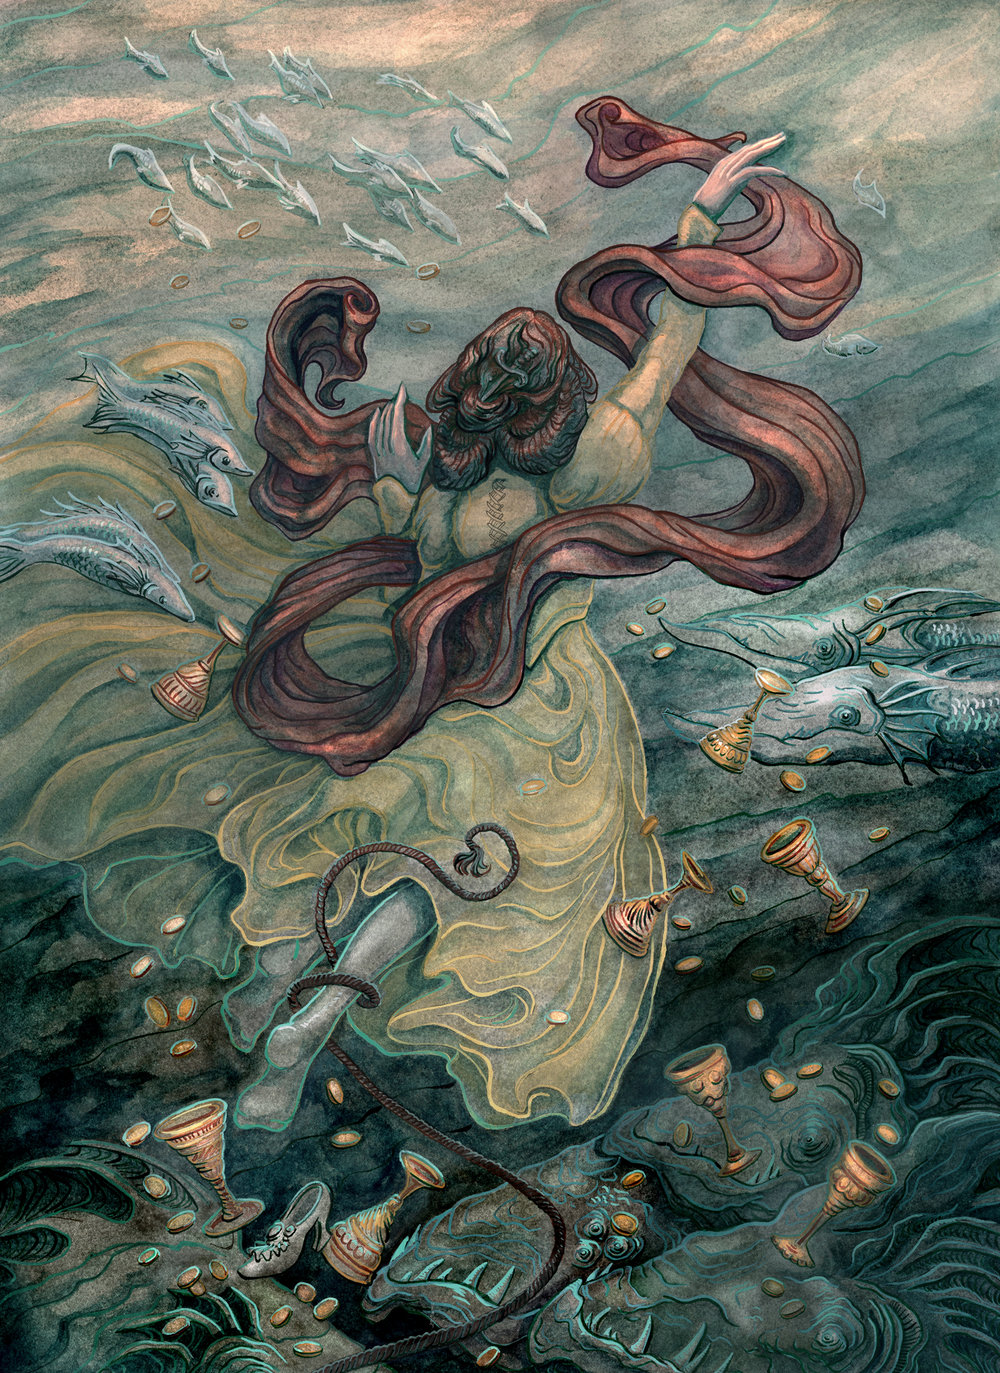 - AscendCreated for the 78 Tarot deck, ElementalPublisher: 78 Tarotwatercolor, ink, gouache